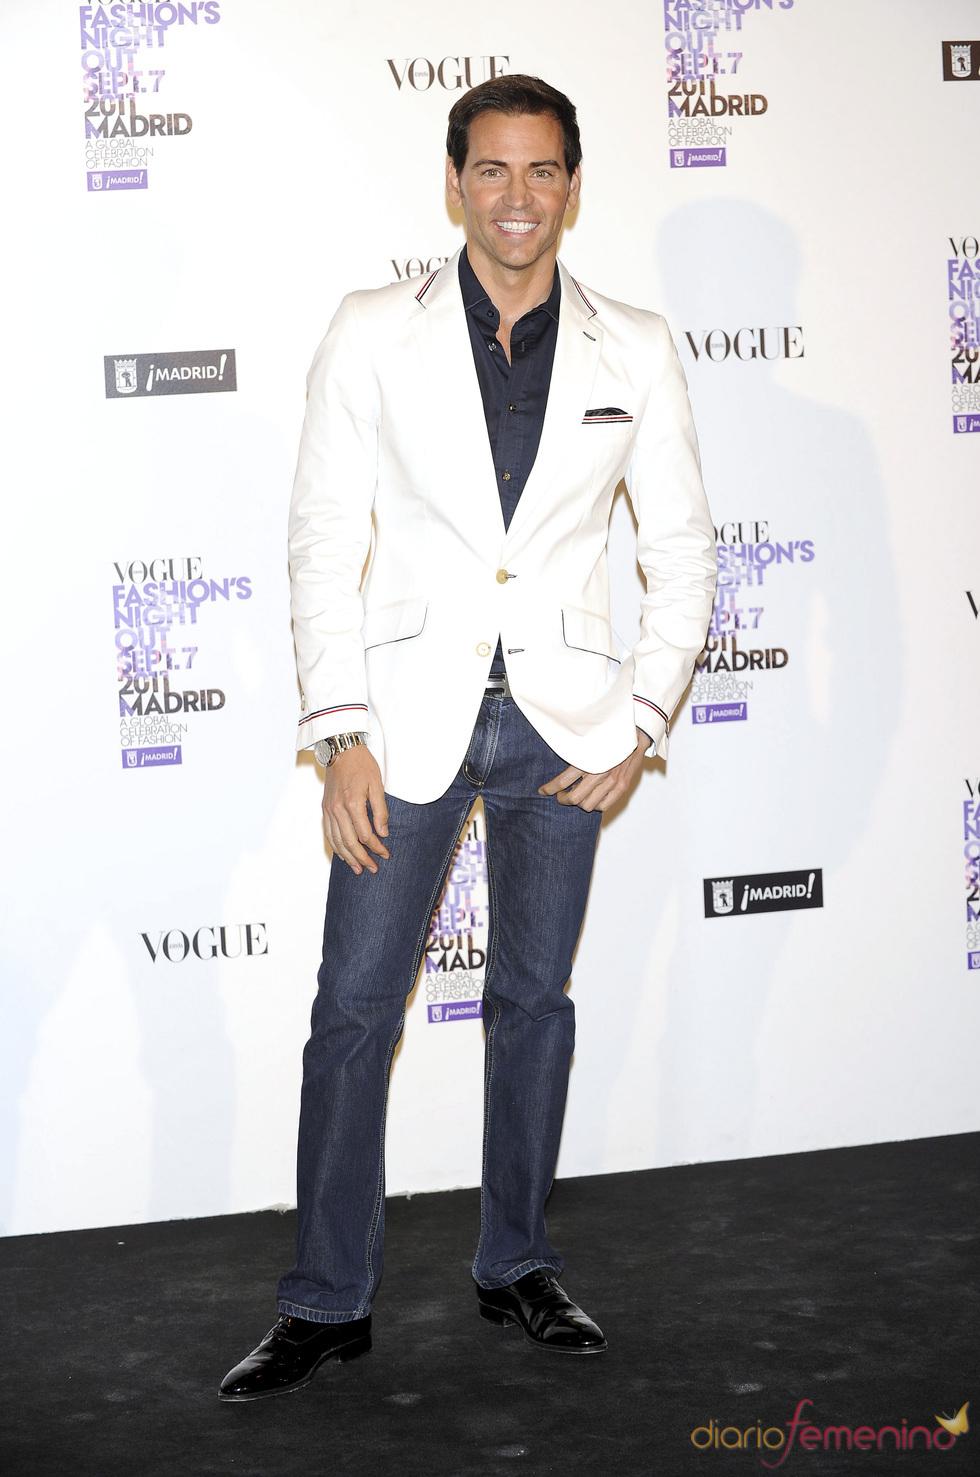 David Meca durante la Vogue Fashion Night Out Madrid 2011